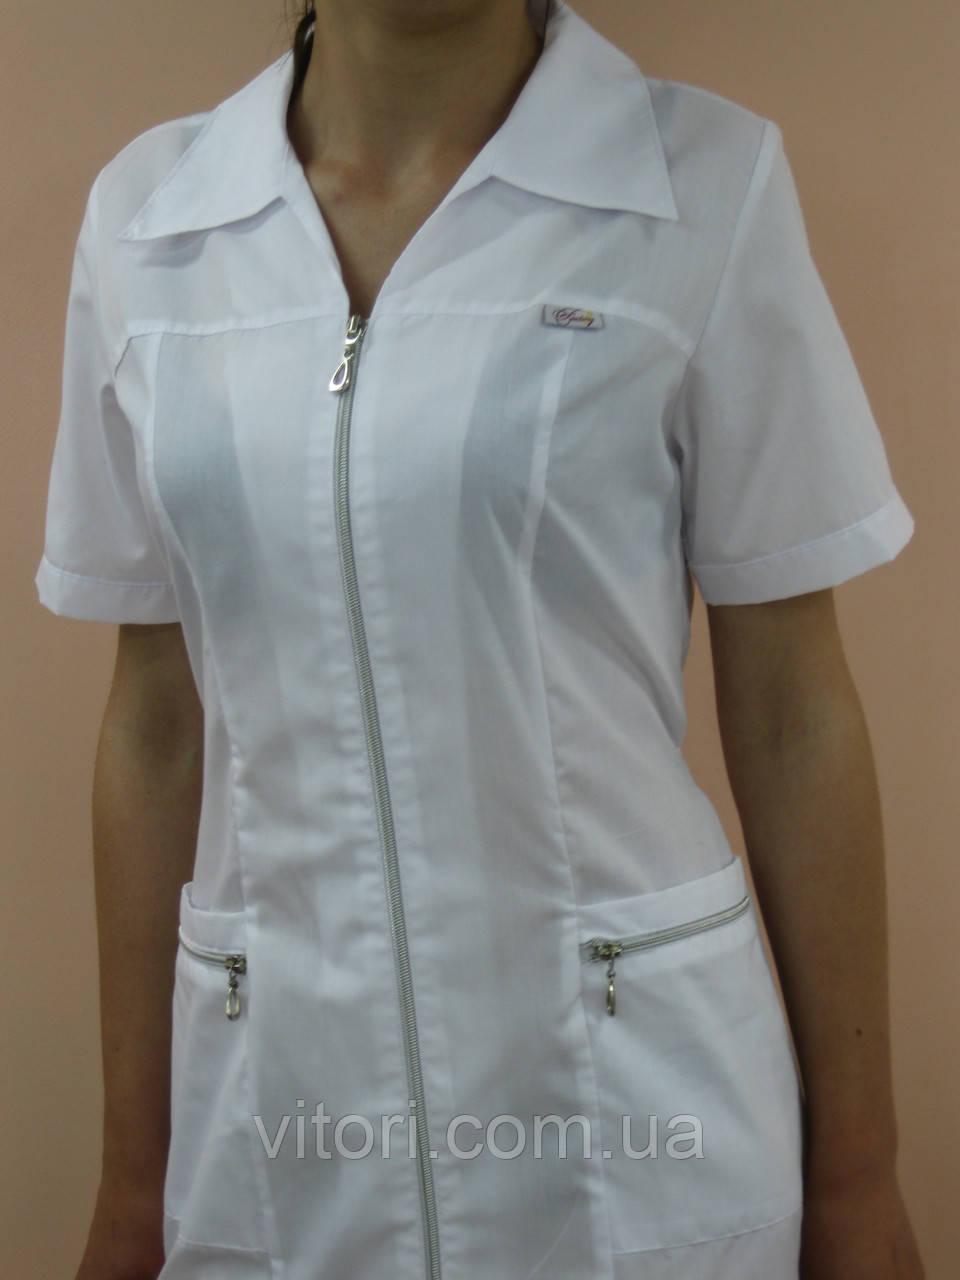 Медицинский женский халат Витори хлопок на молнии короткий рукав